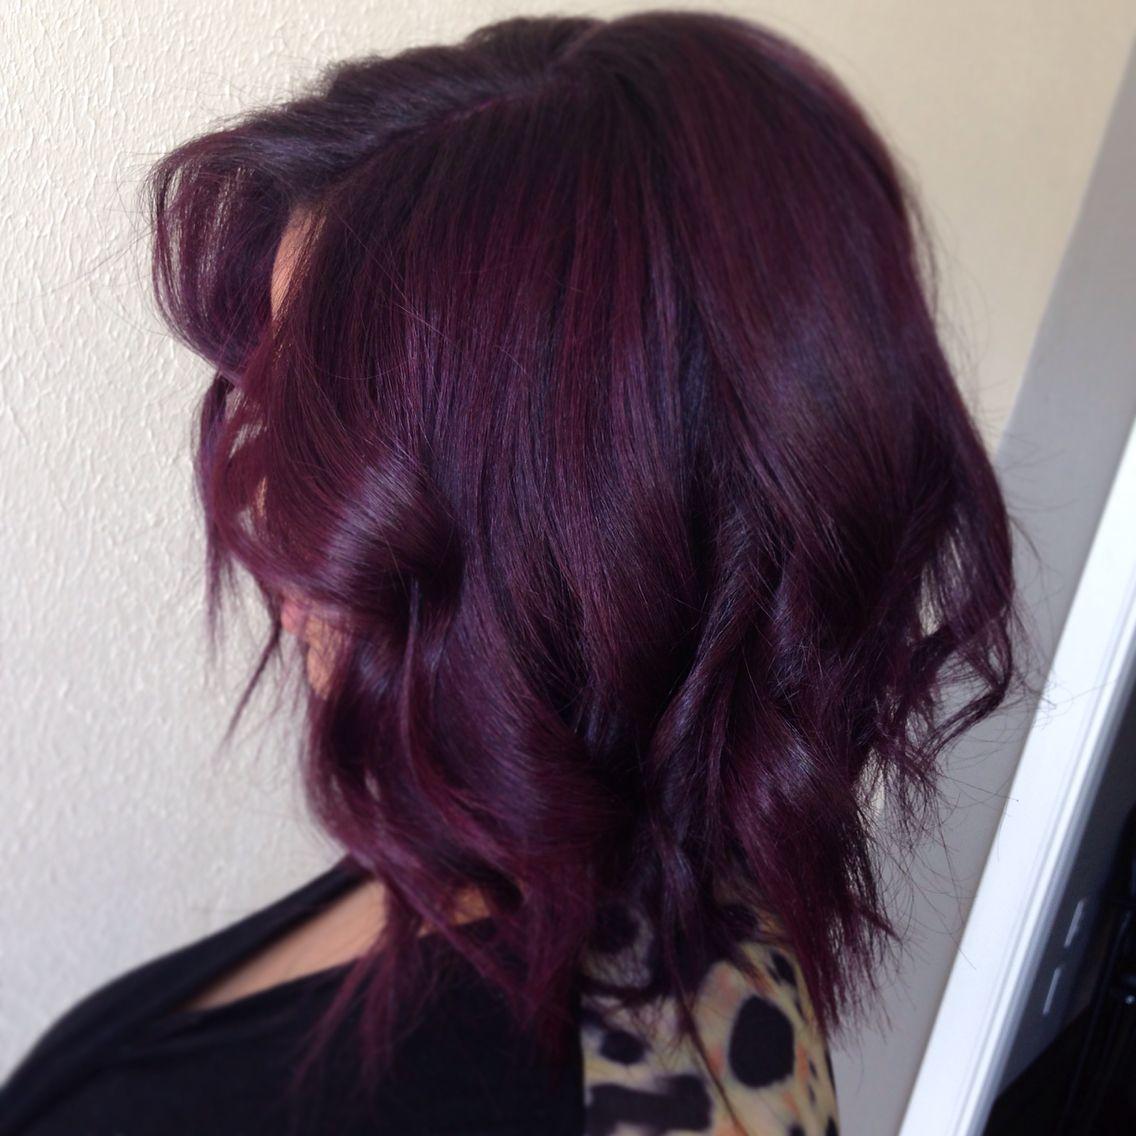 hair by kierra taylor dallas texas colorist deep plum lob female. Black Bedroom Furniture Sets. Home Design Ideas